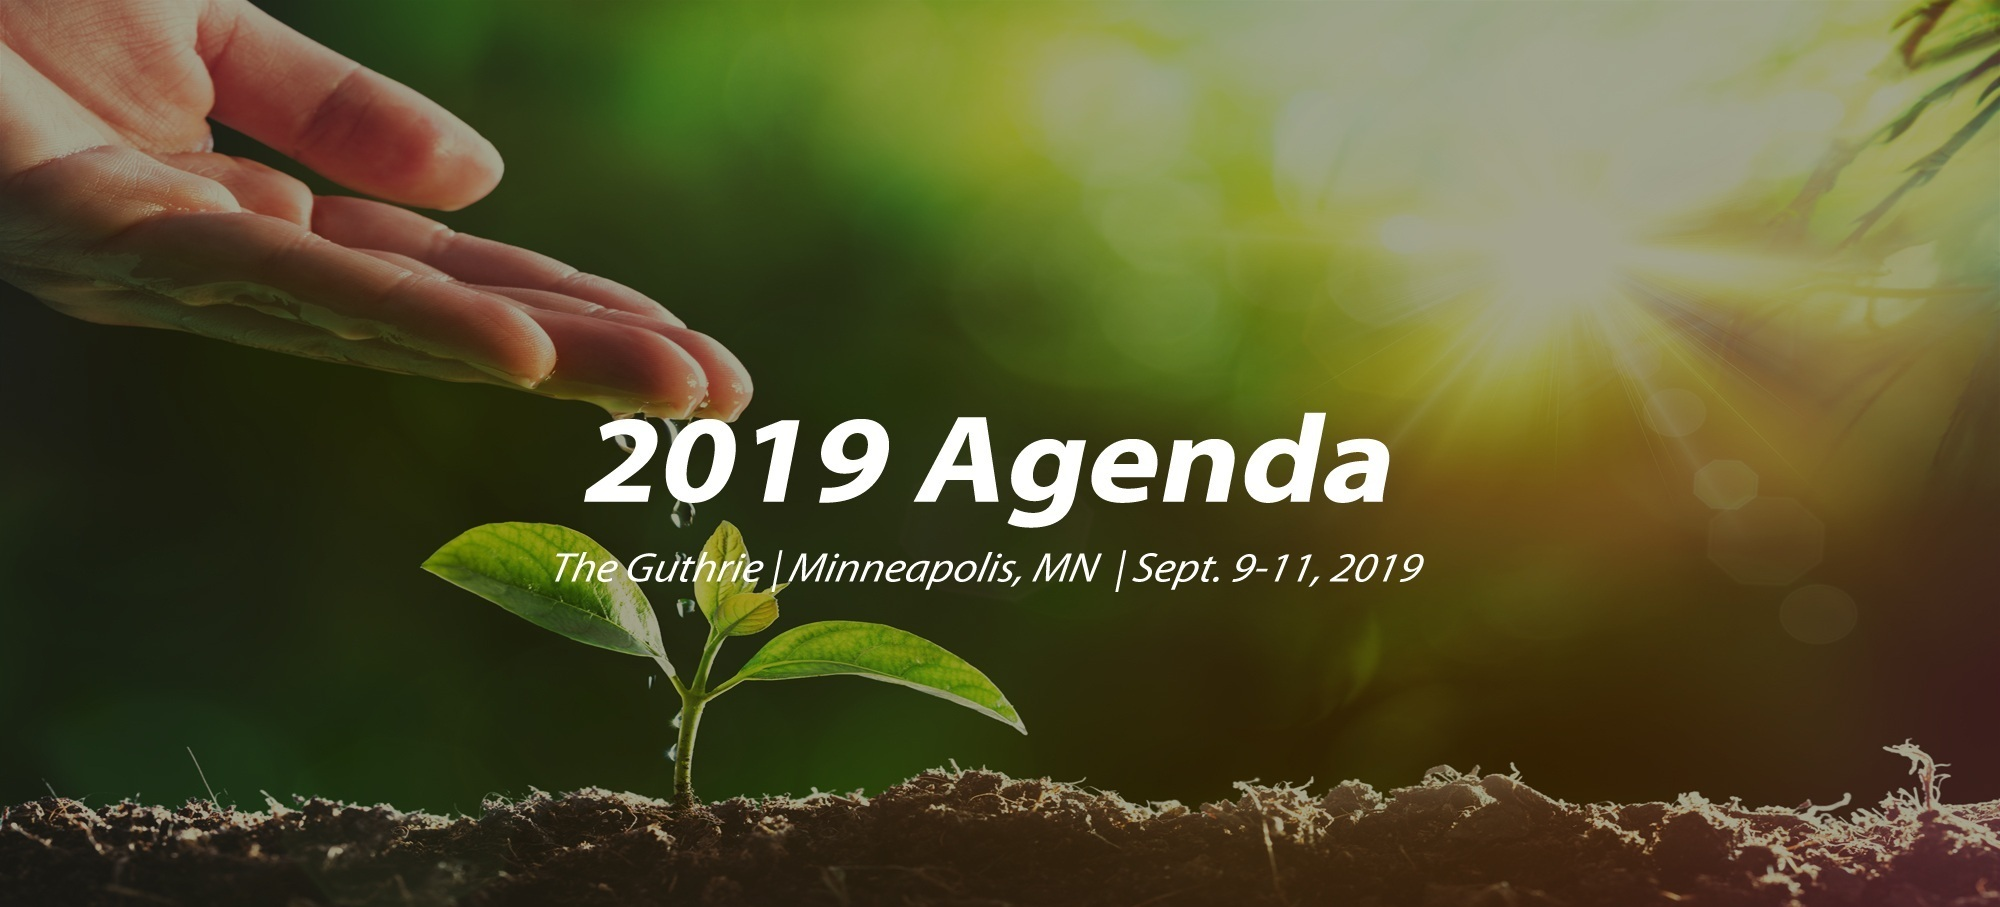 2019 Agenda — Ag Innovation Showcase